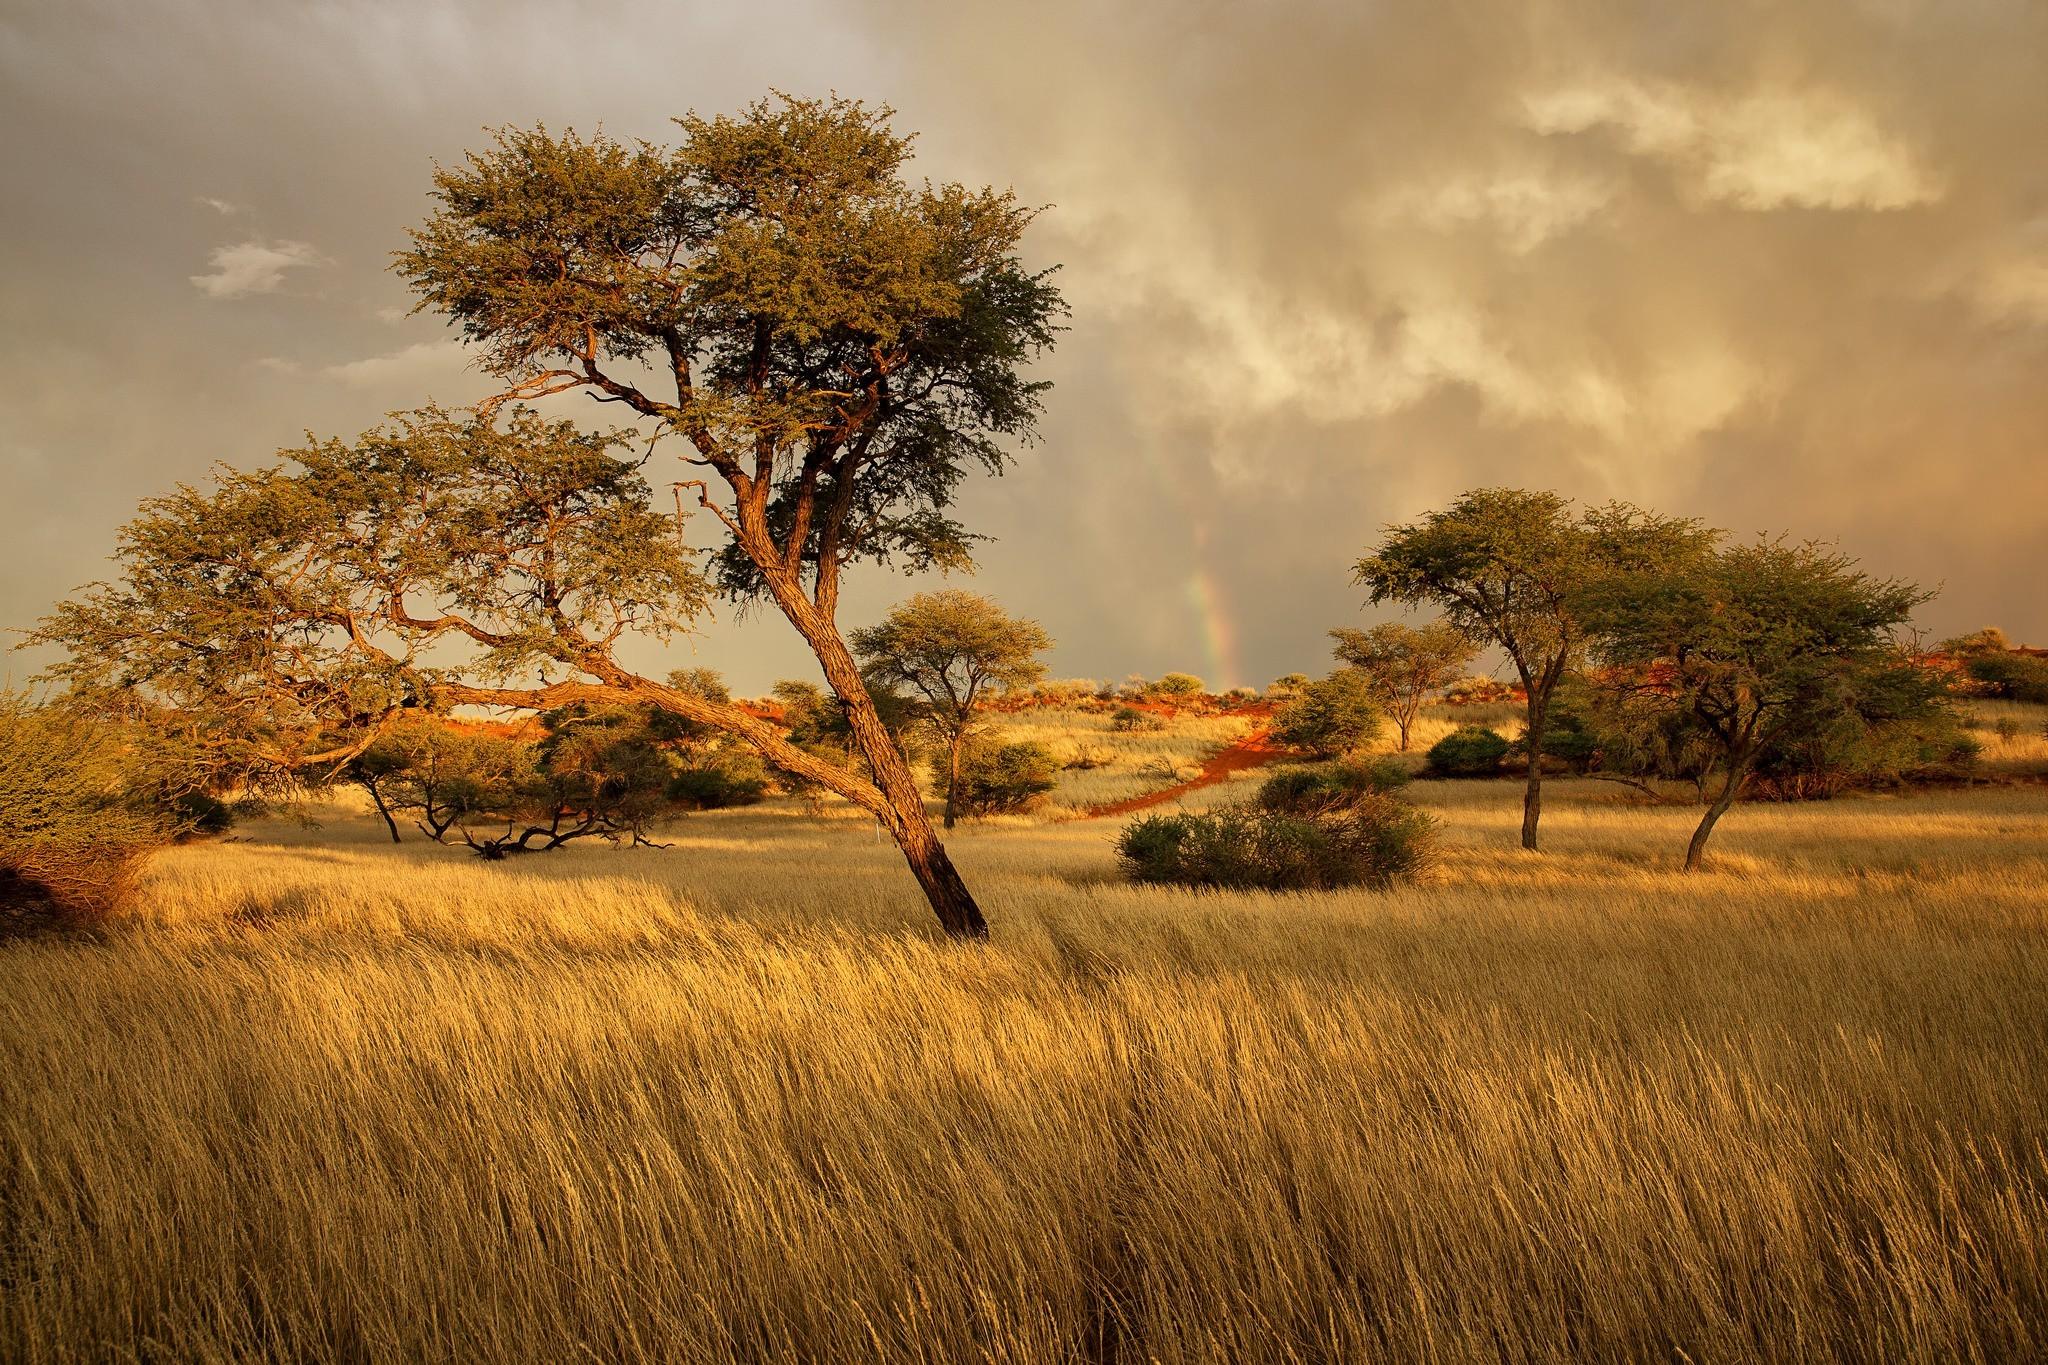 africa wallpaper,natural landscape,nature,savanna,natural environment,tree